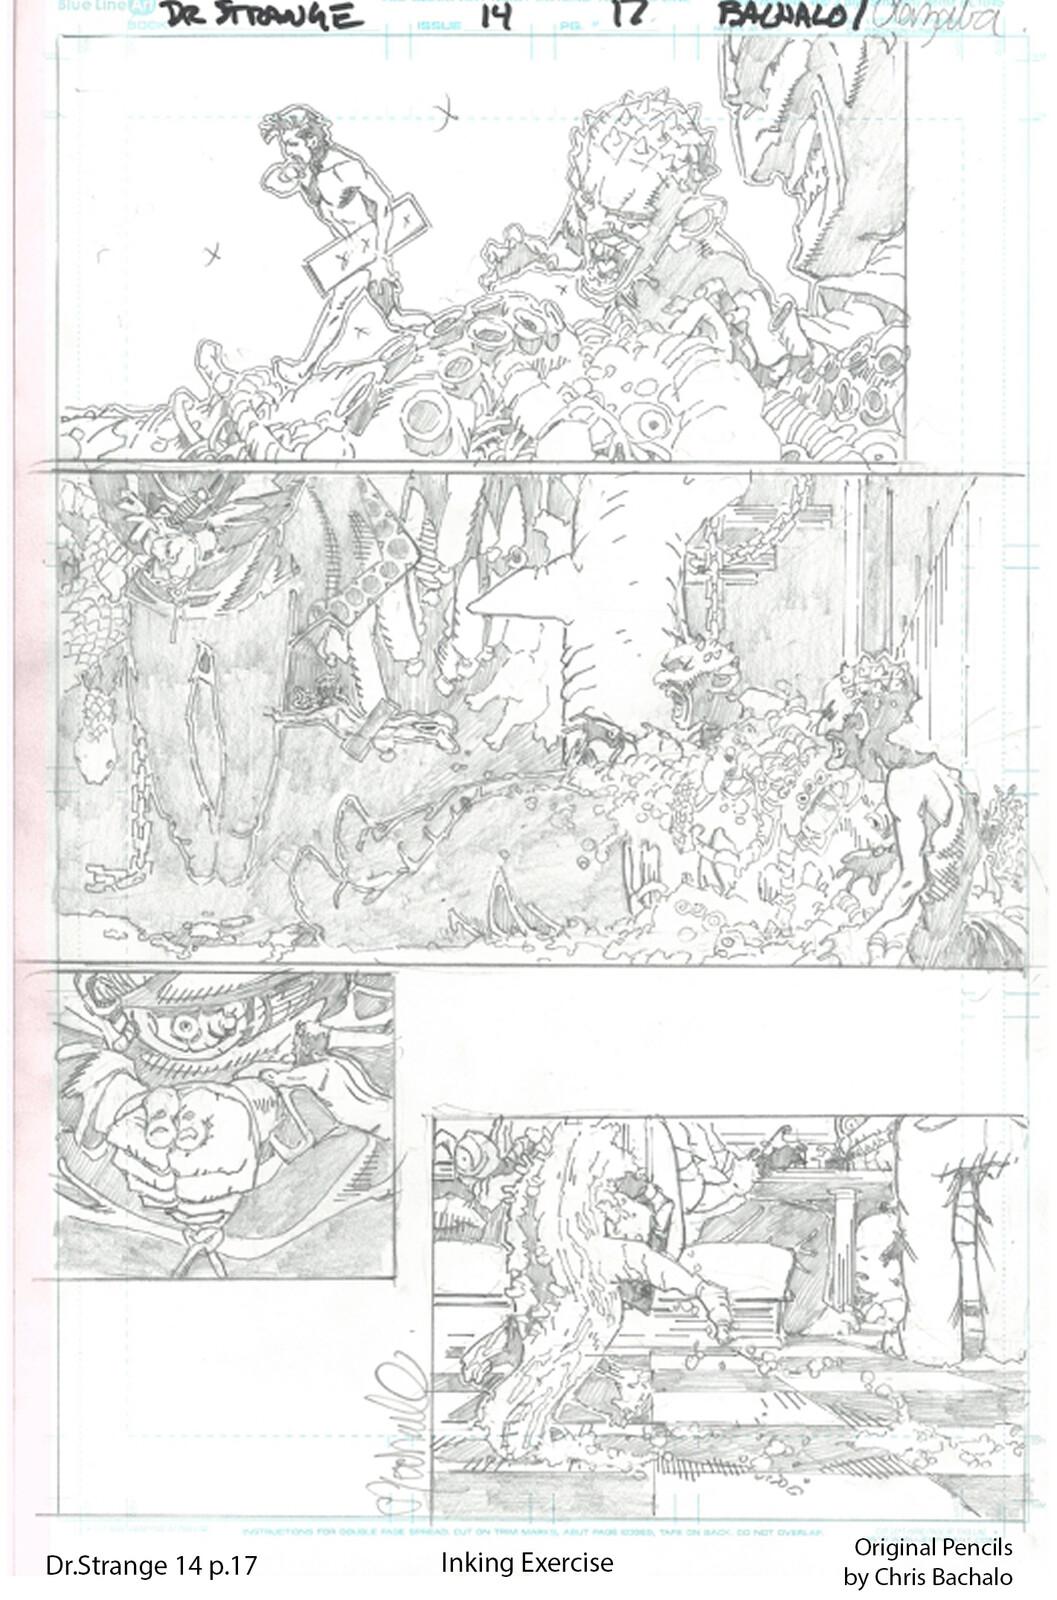 Dr.Strange #14 - page 17 Original pencils by Chris Bachalo